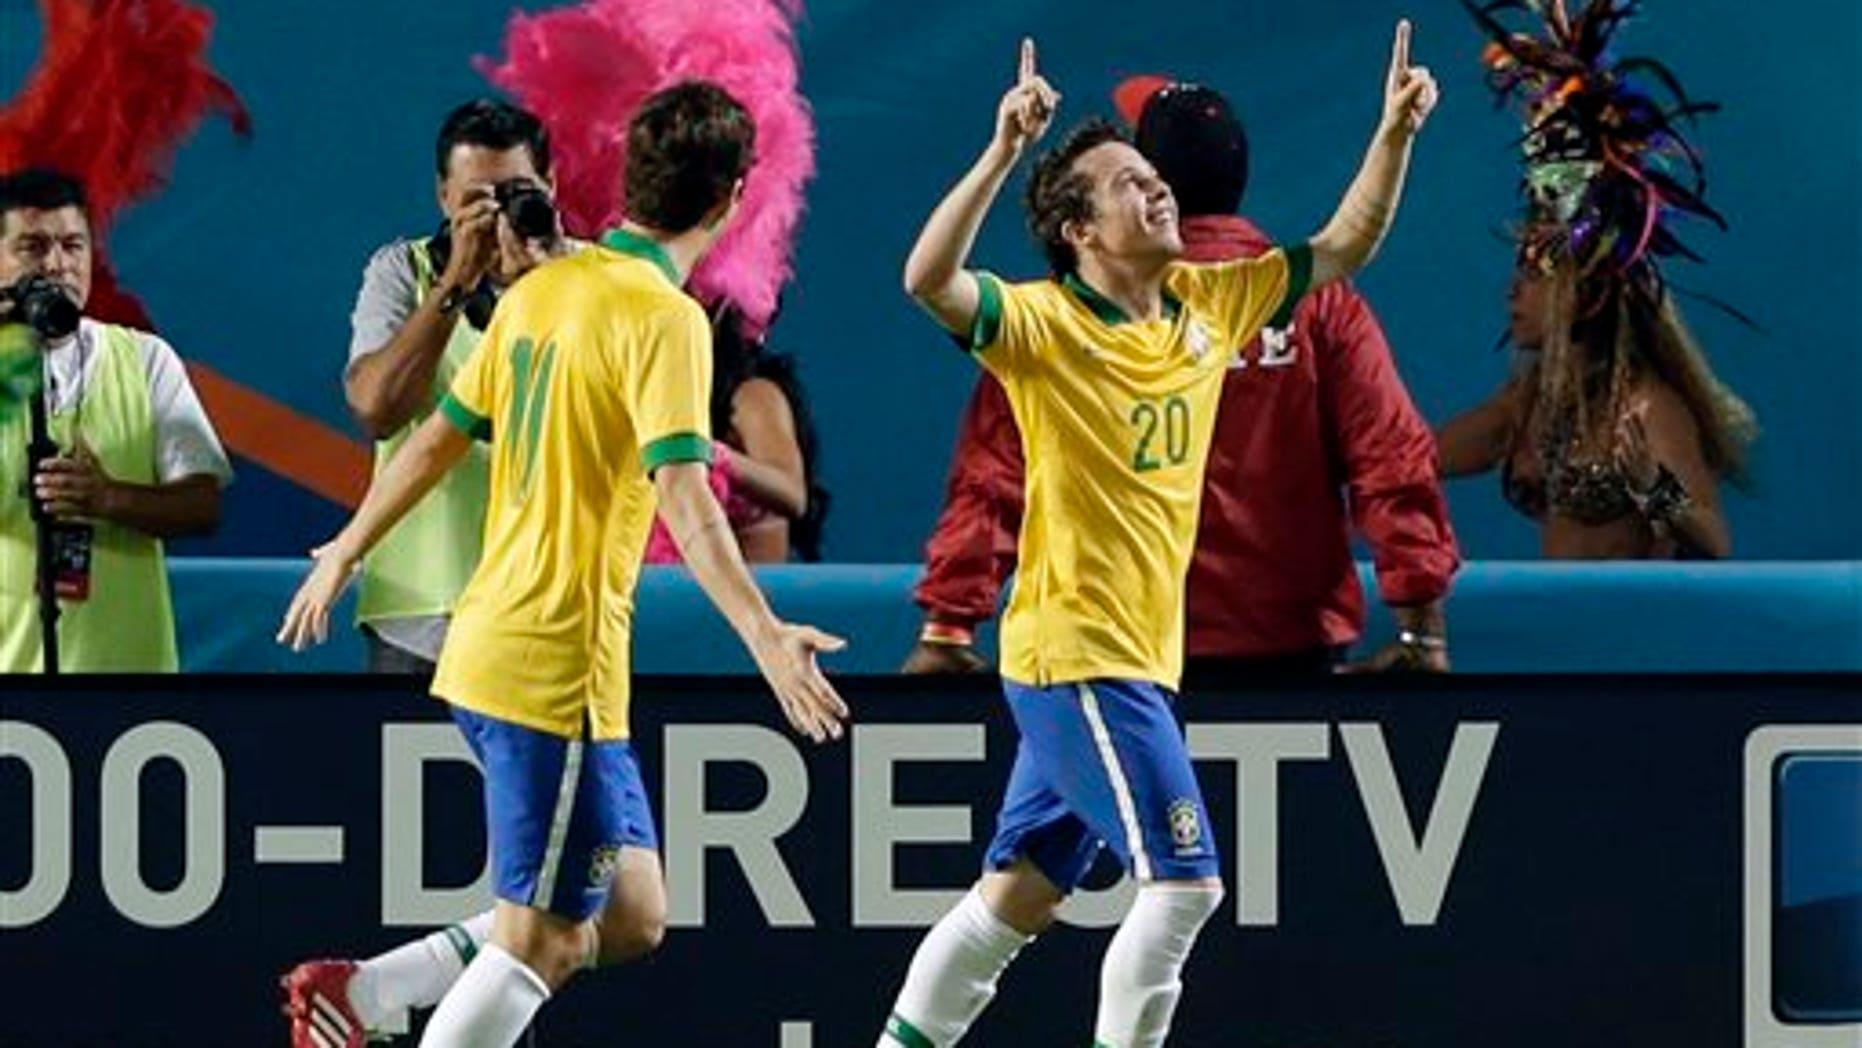 Brazil forward Bernard (20) celebrates his goal with midfielder Oscar (11) during the first half of an international friendly soccer game against Honduras, Saturday, Nov. 16, 2013, in Miami Gardens, Fla. (AP Photo/Wilfredo Lee)